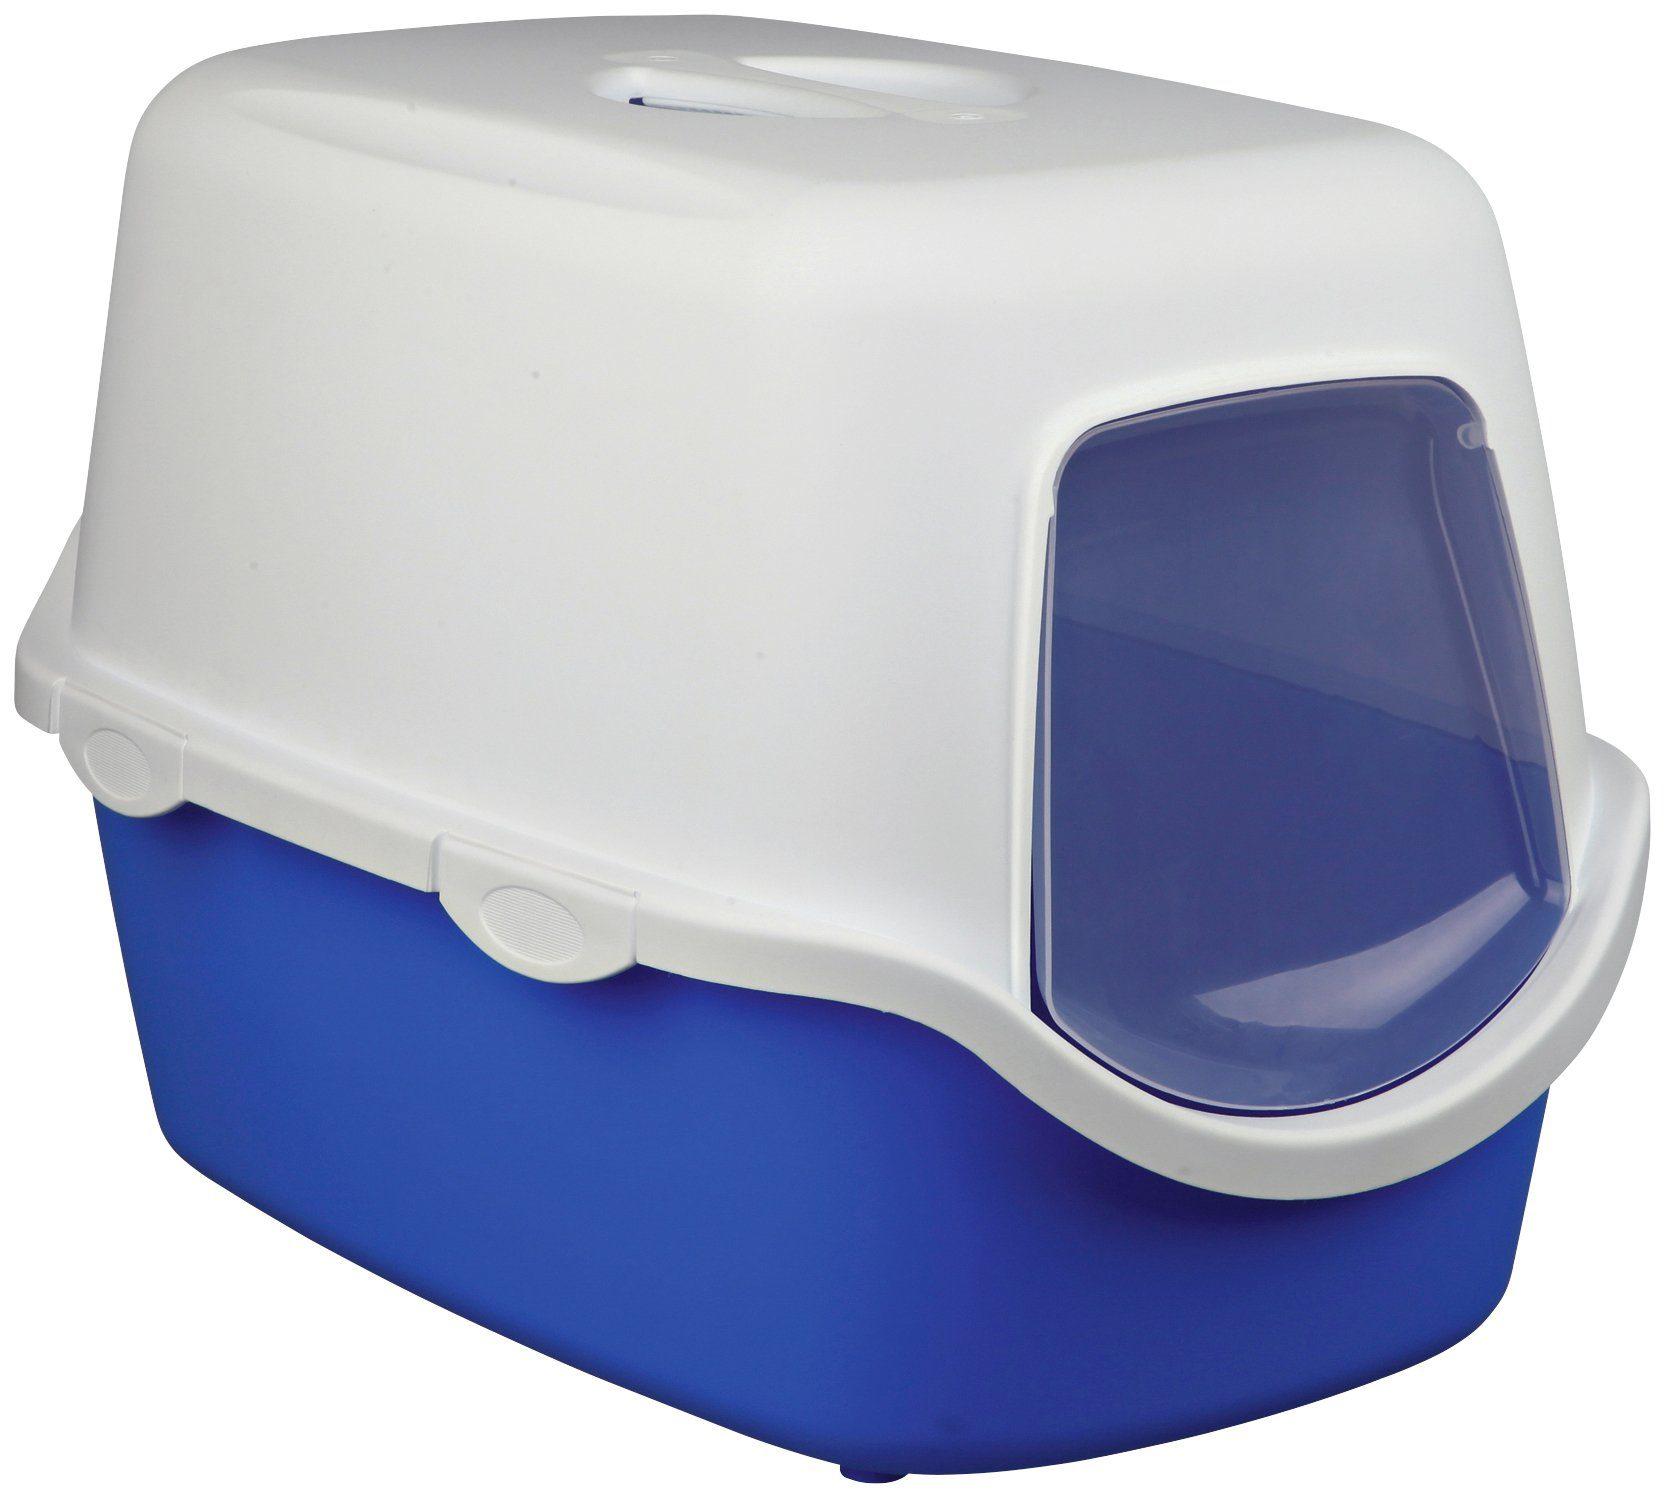 Katzentoilette »Vico«, B/T/H: 40/56/40 cm, blau/weiß